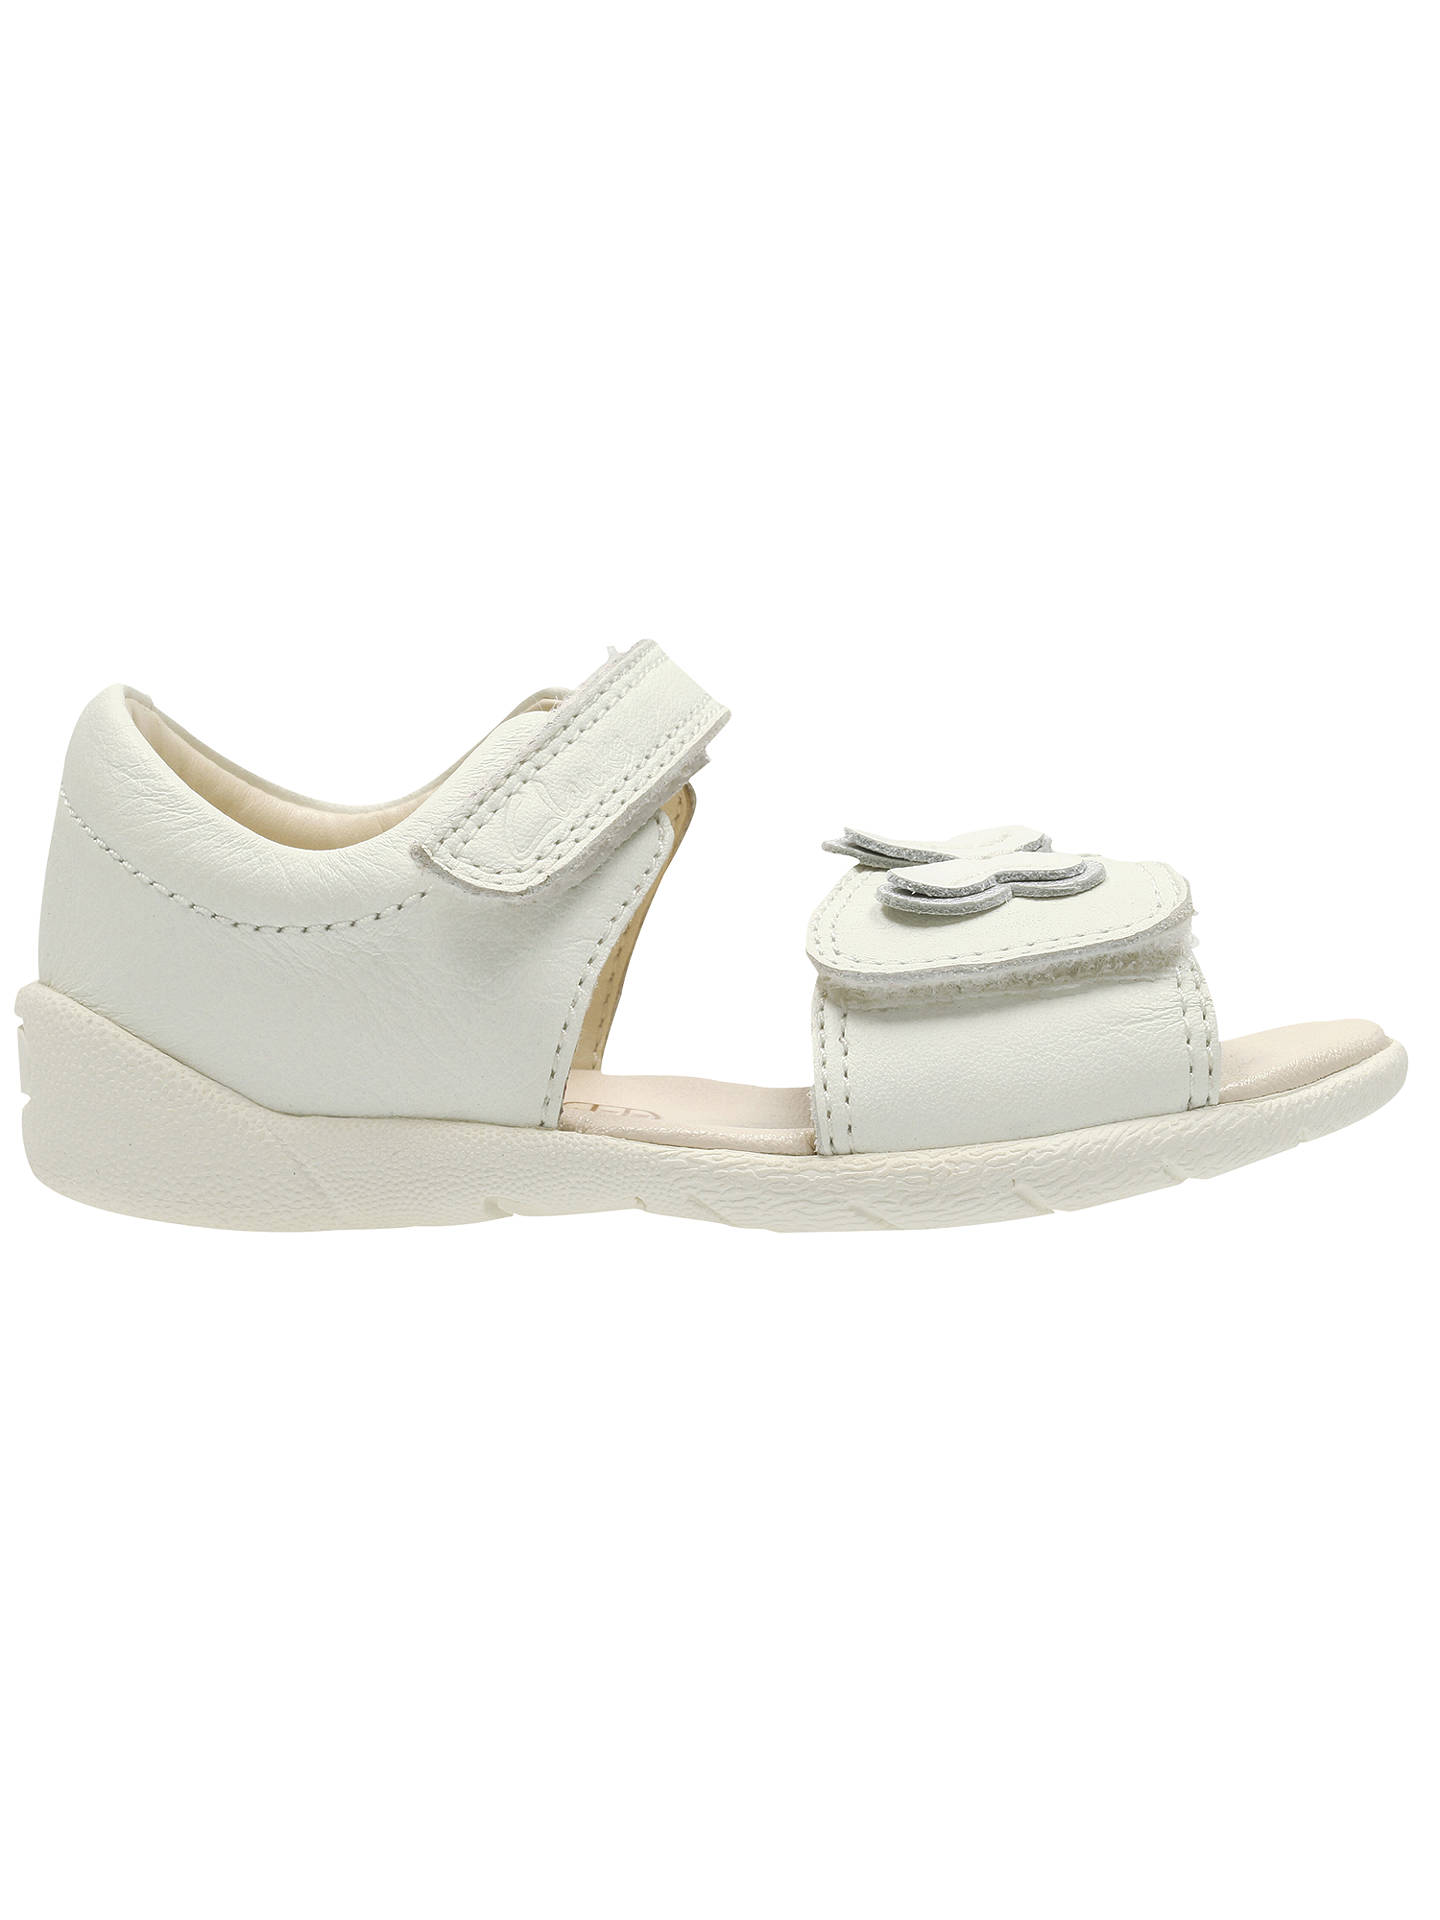 deseable Bebida Todo el mundo  Clarks Baby Kiani Sun Rip-Tape Leather Sandals, White at John Lewis &  Partners